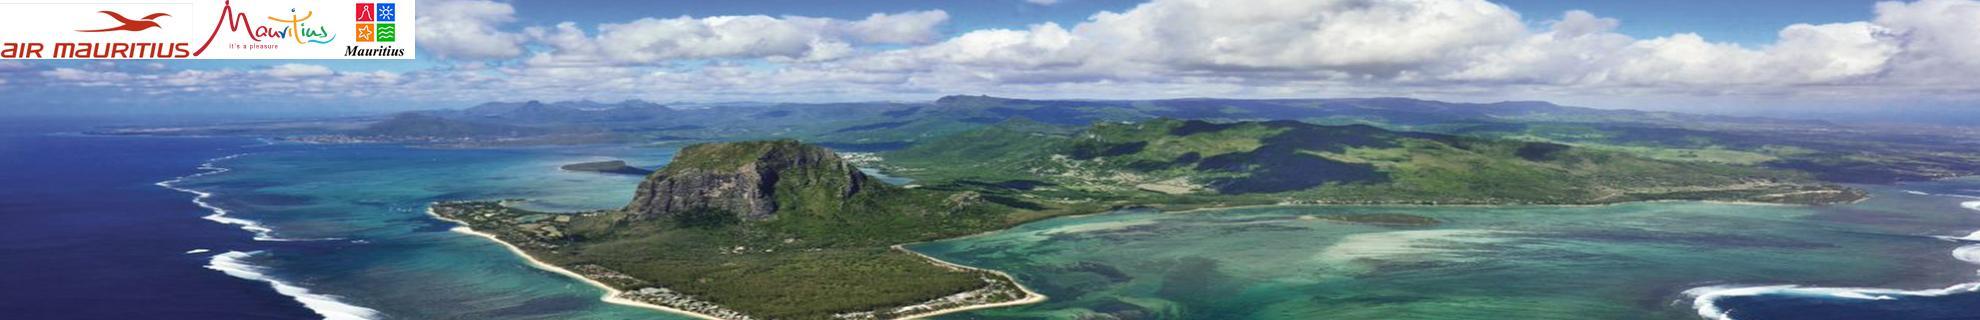 siti di incontri online in Mauritius